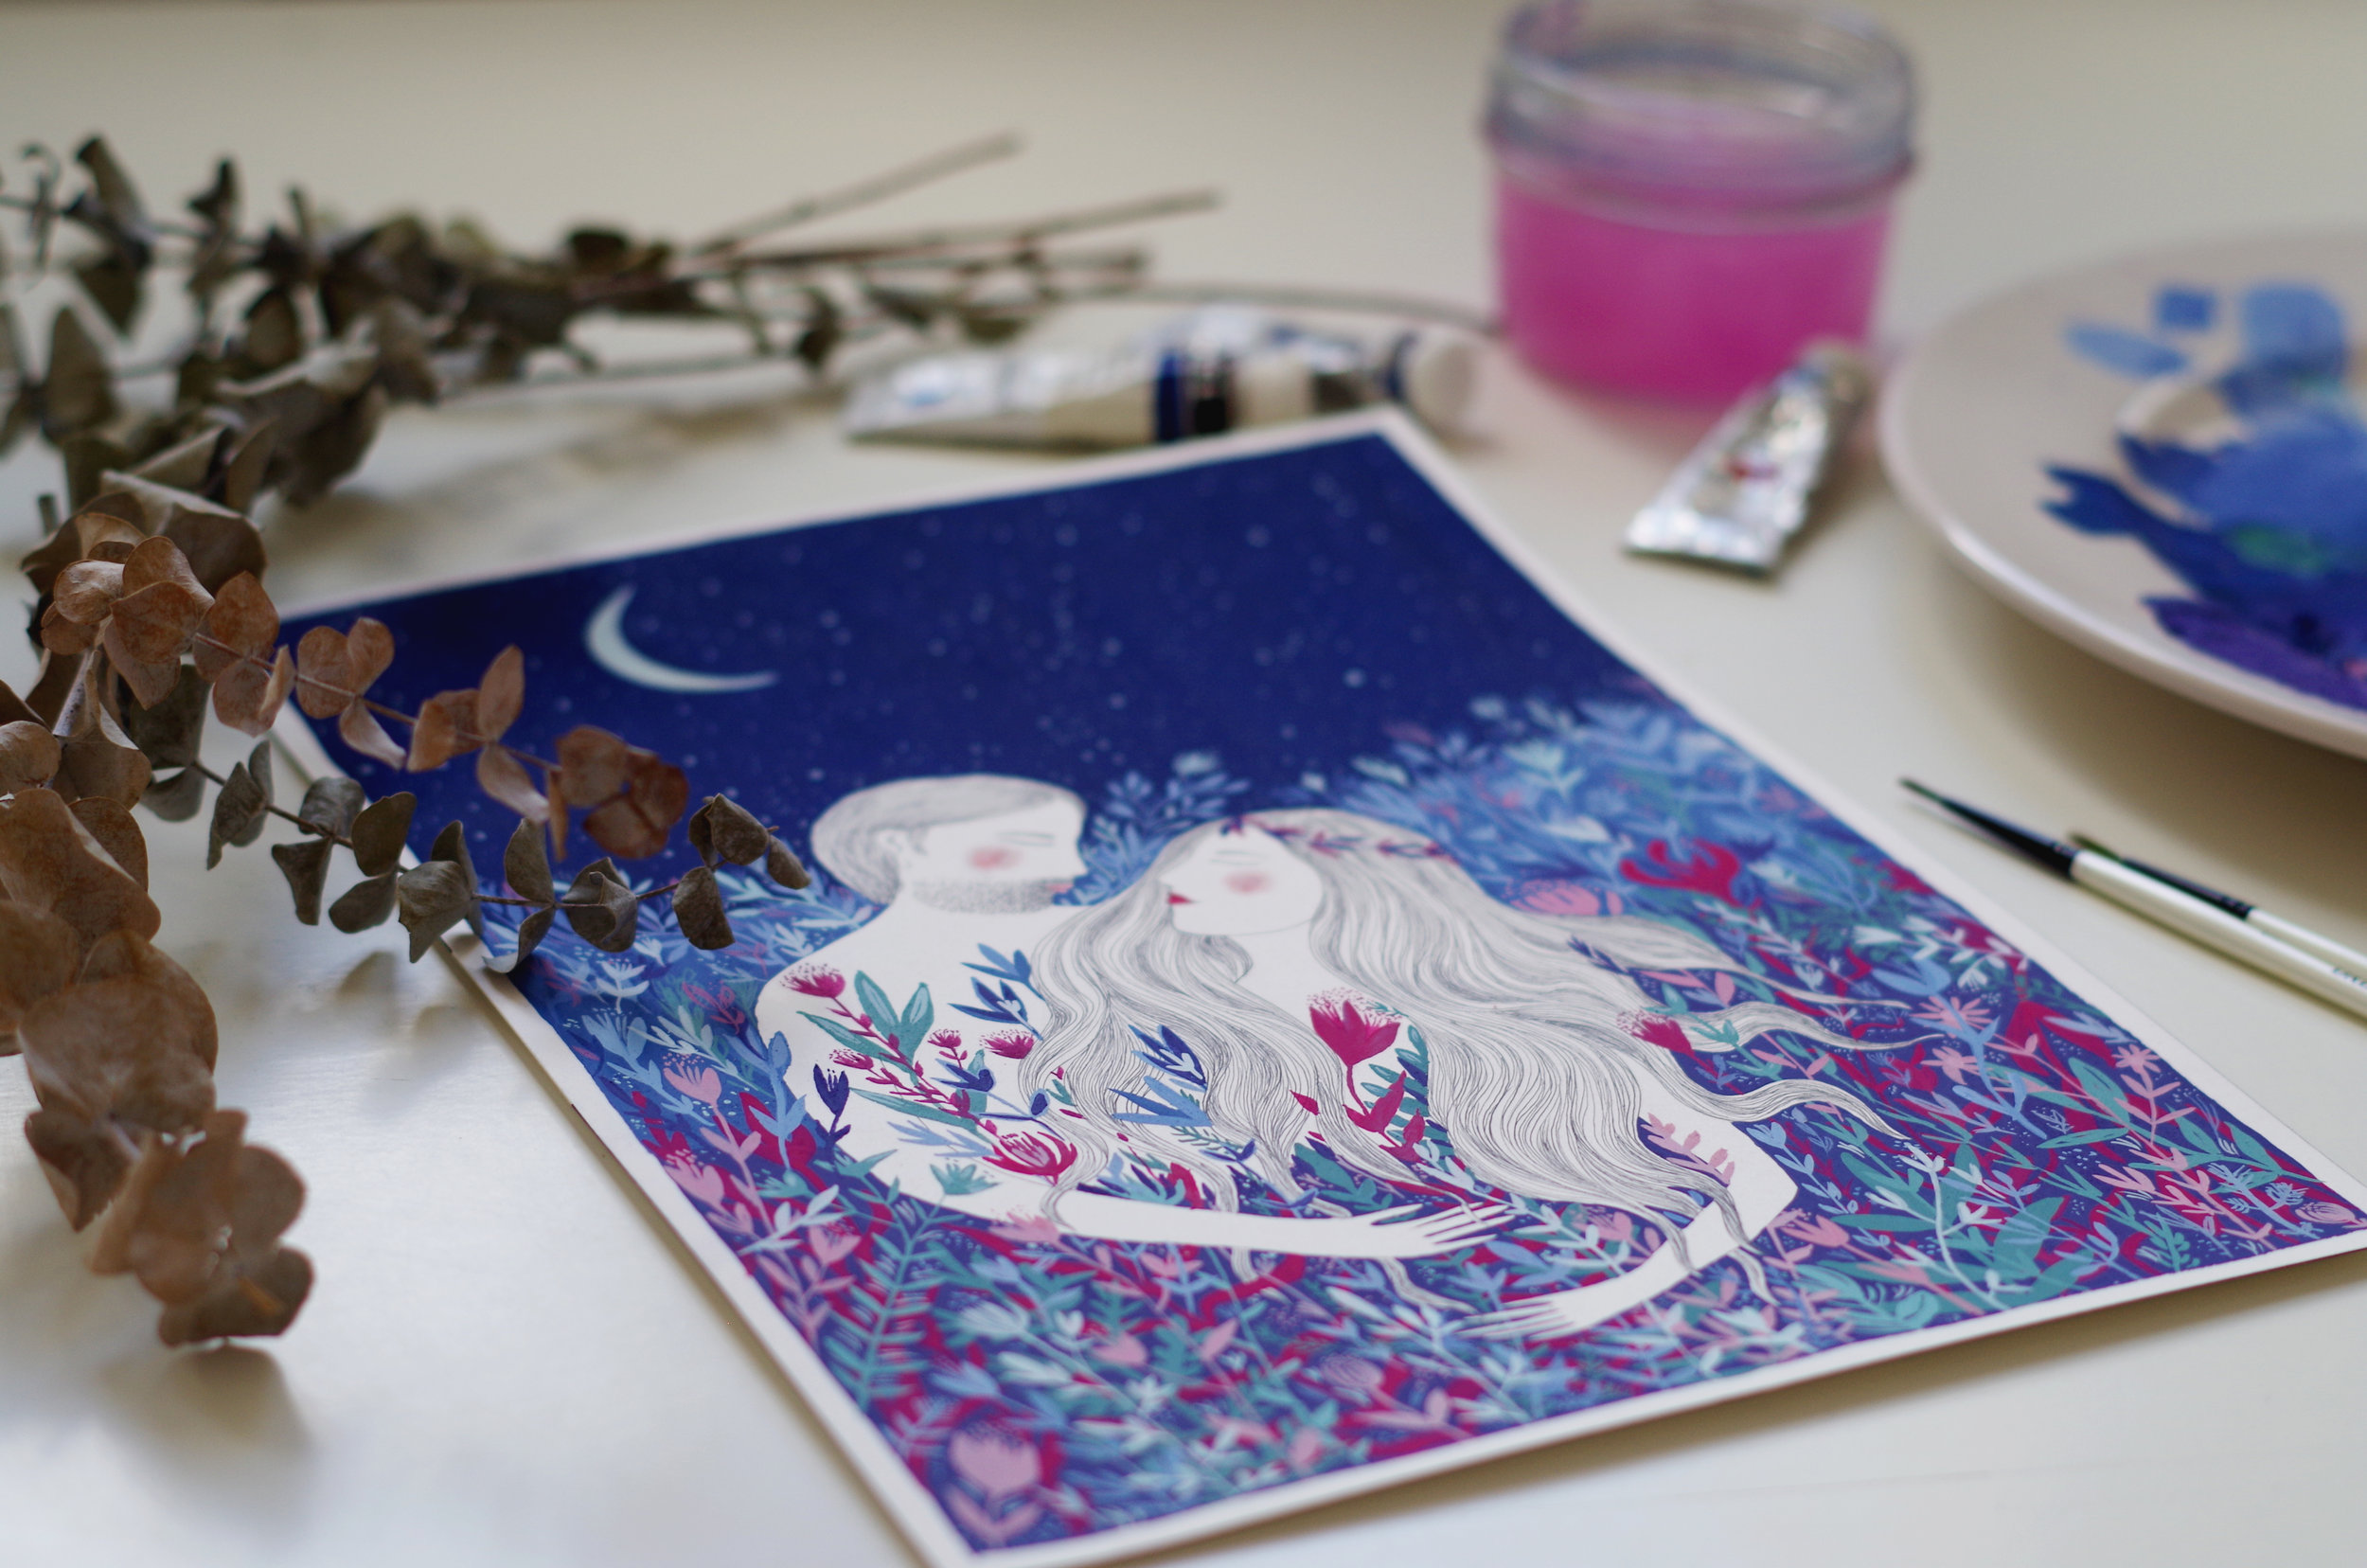 4Adam&Eve_Janina_Bourosu_Ilustration_2018.jpg